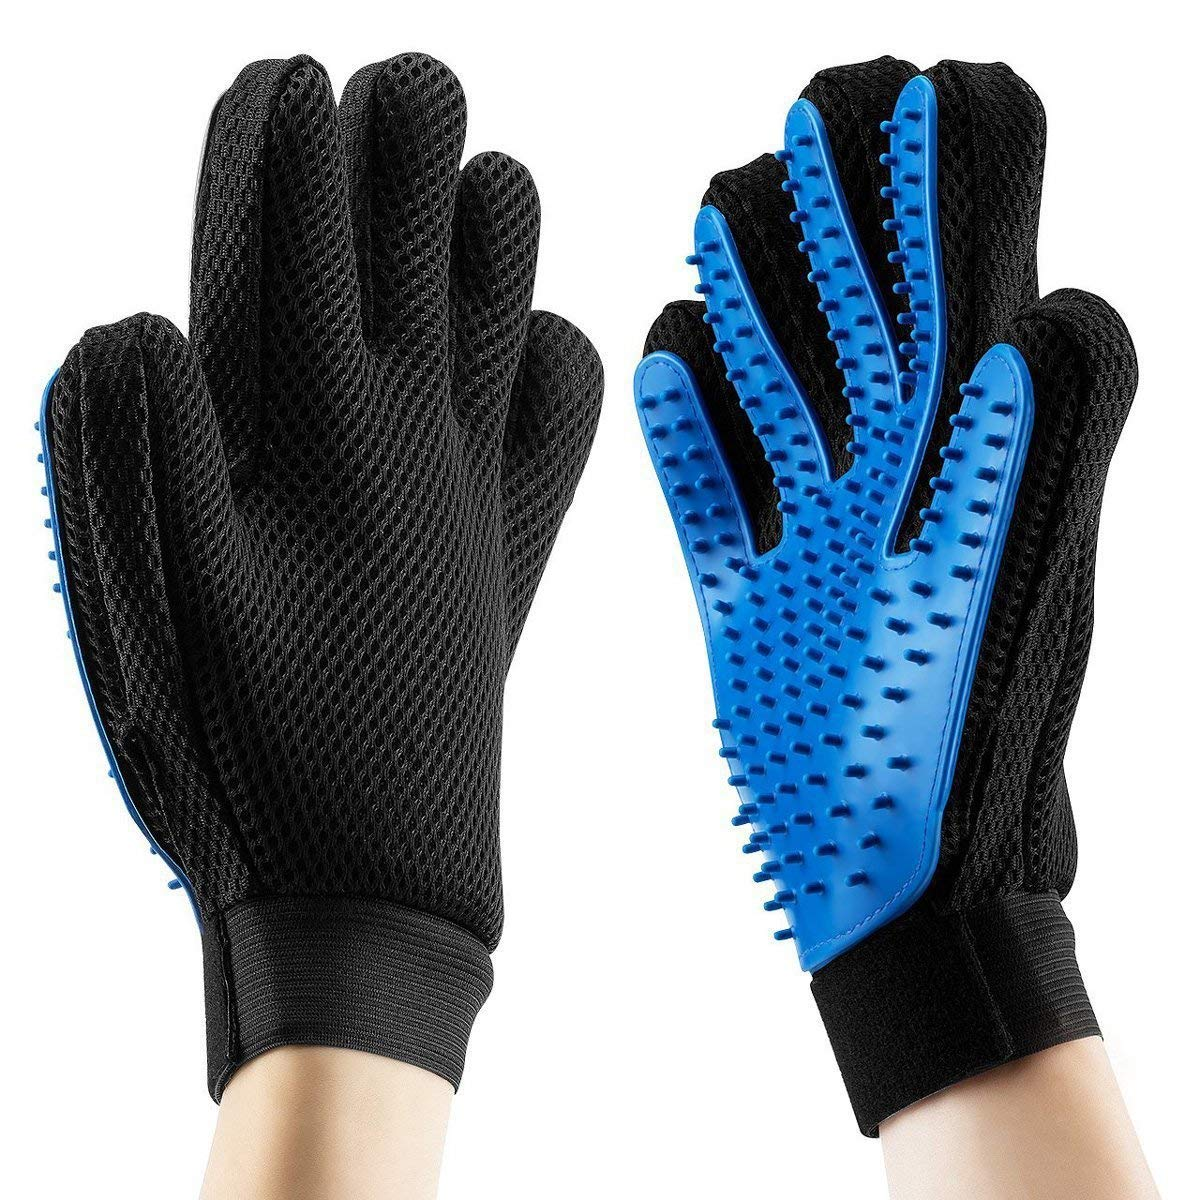 WLEJDDD Pet Gloves Silica Gel Double-Sided Hair Removal Clean Massage Pet Products Dog Gloves Dog Grooming Deshedding Brush 2PCS Single Side M